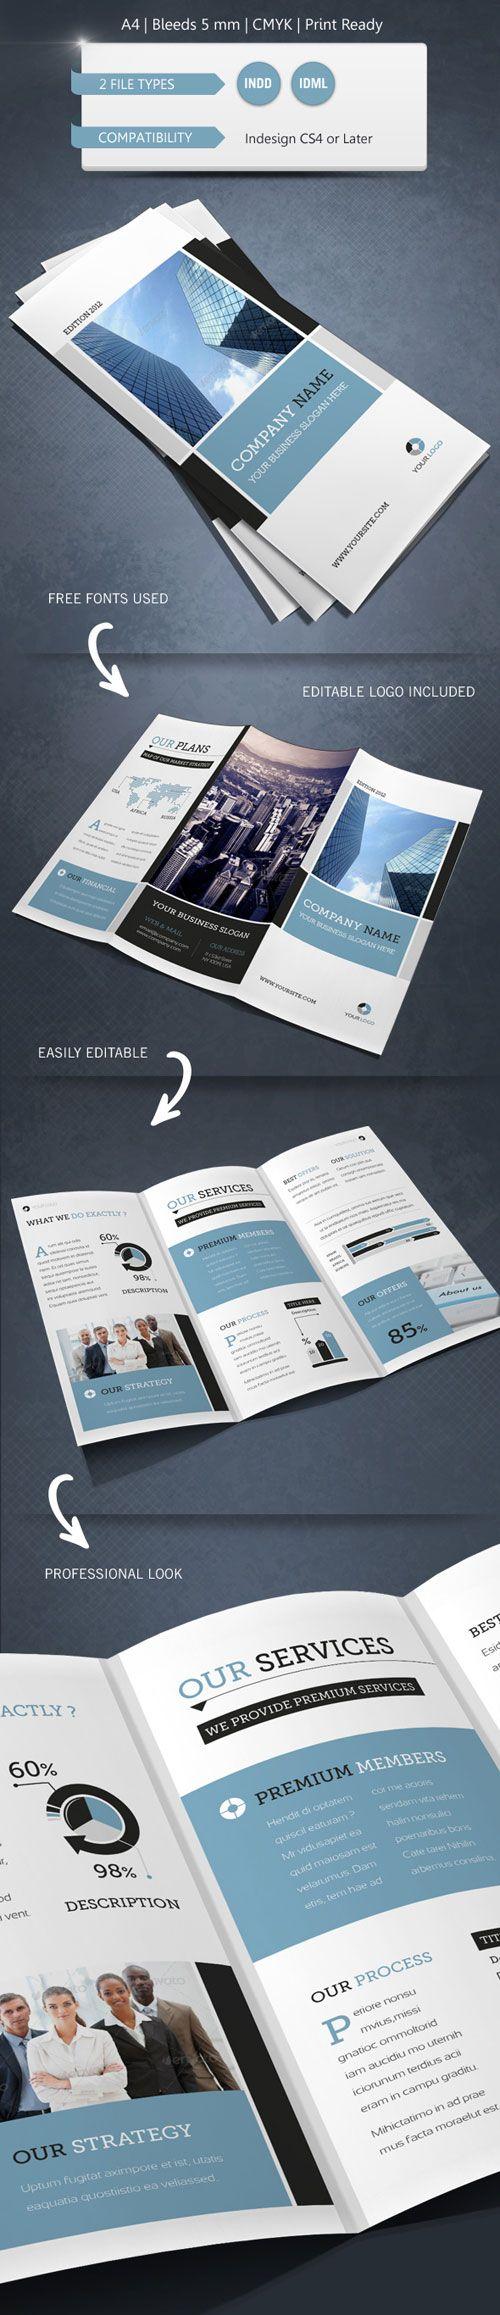 modern brochure design inspiration - 17 best tri fold brochure inspiration images on pinterest